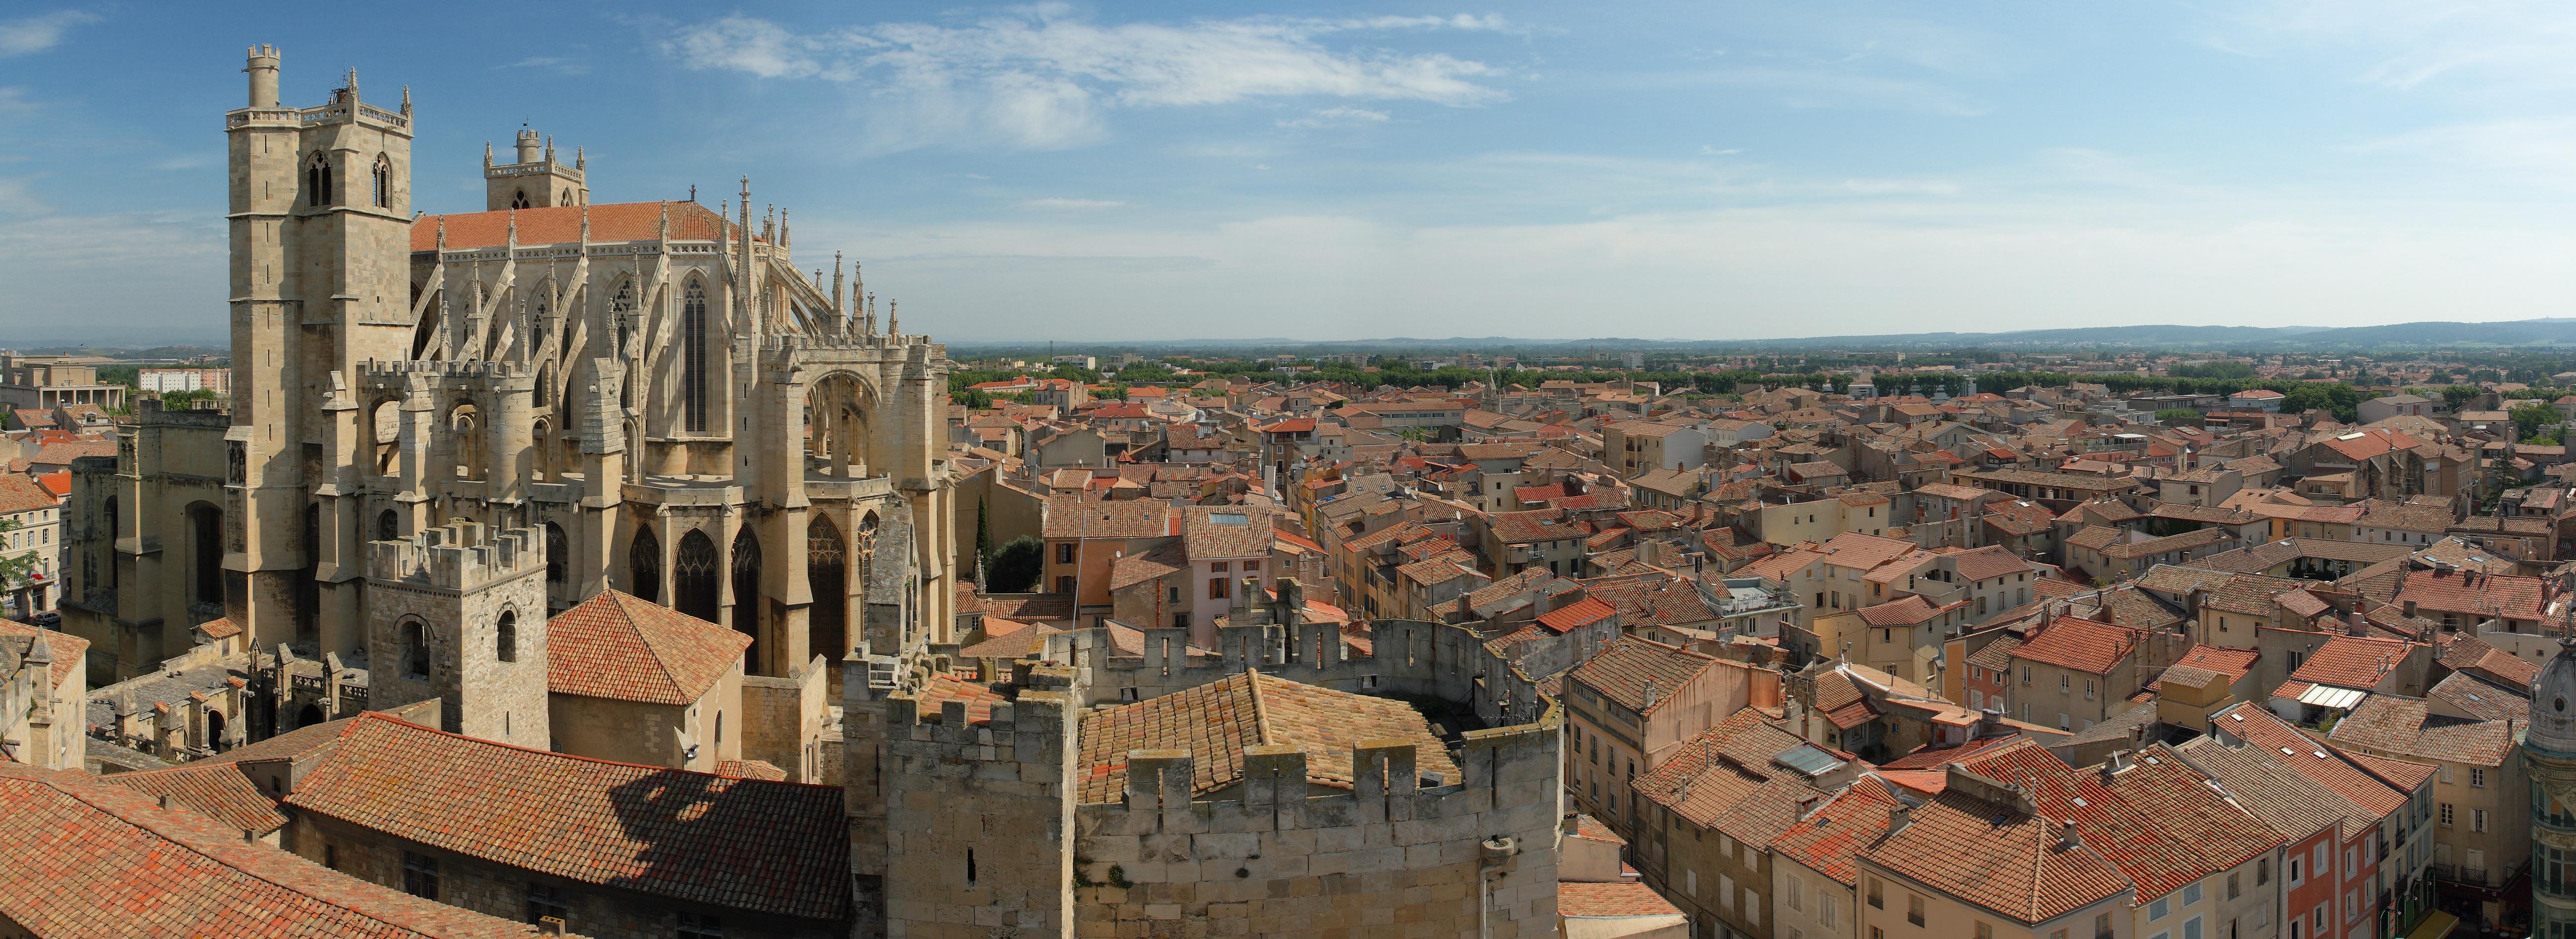 Narbonne_panorama.jpg